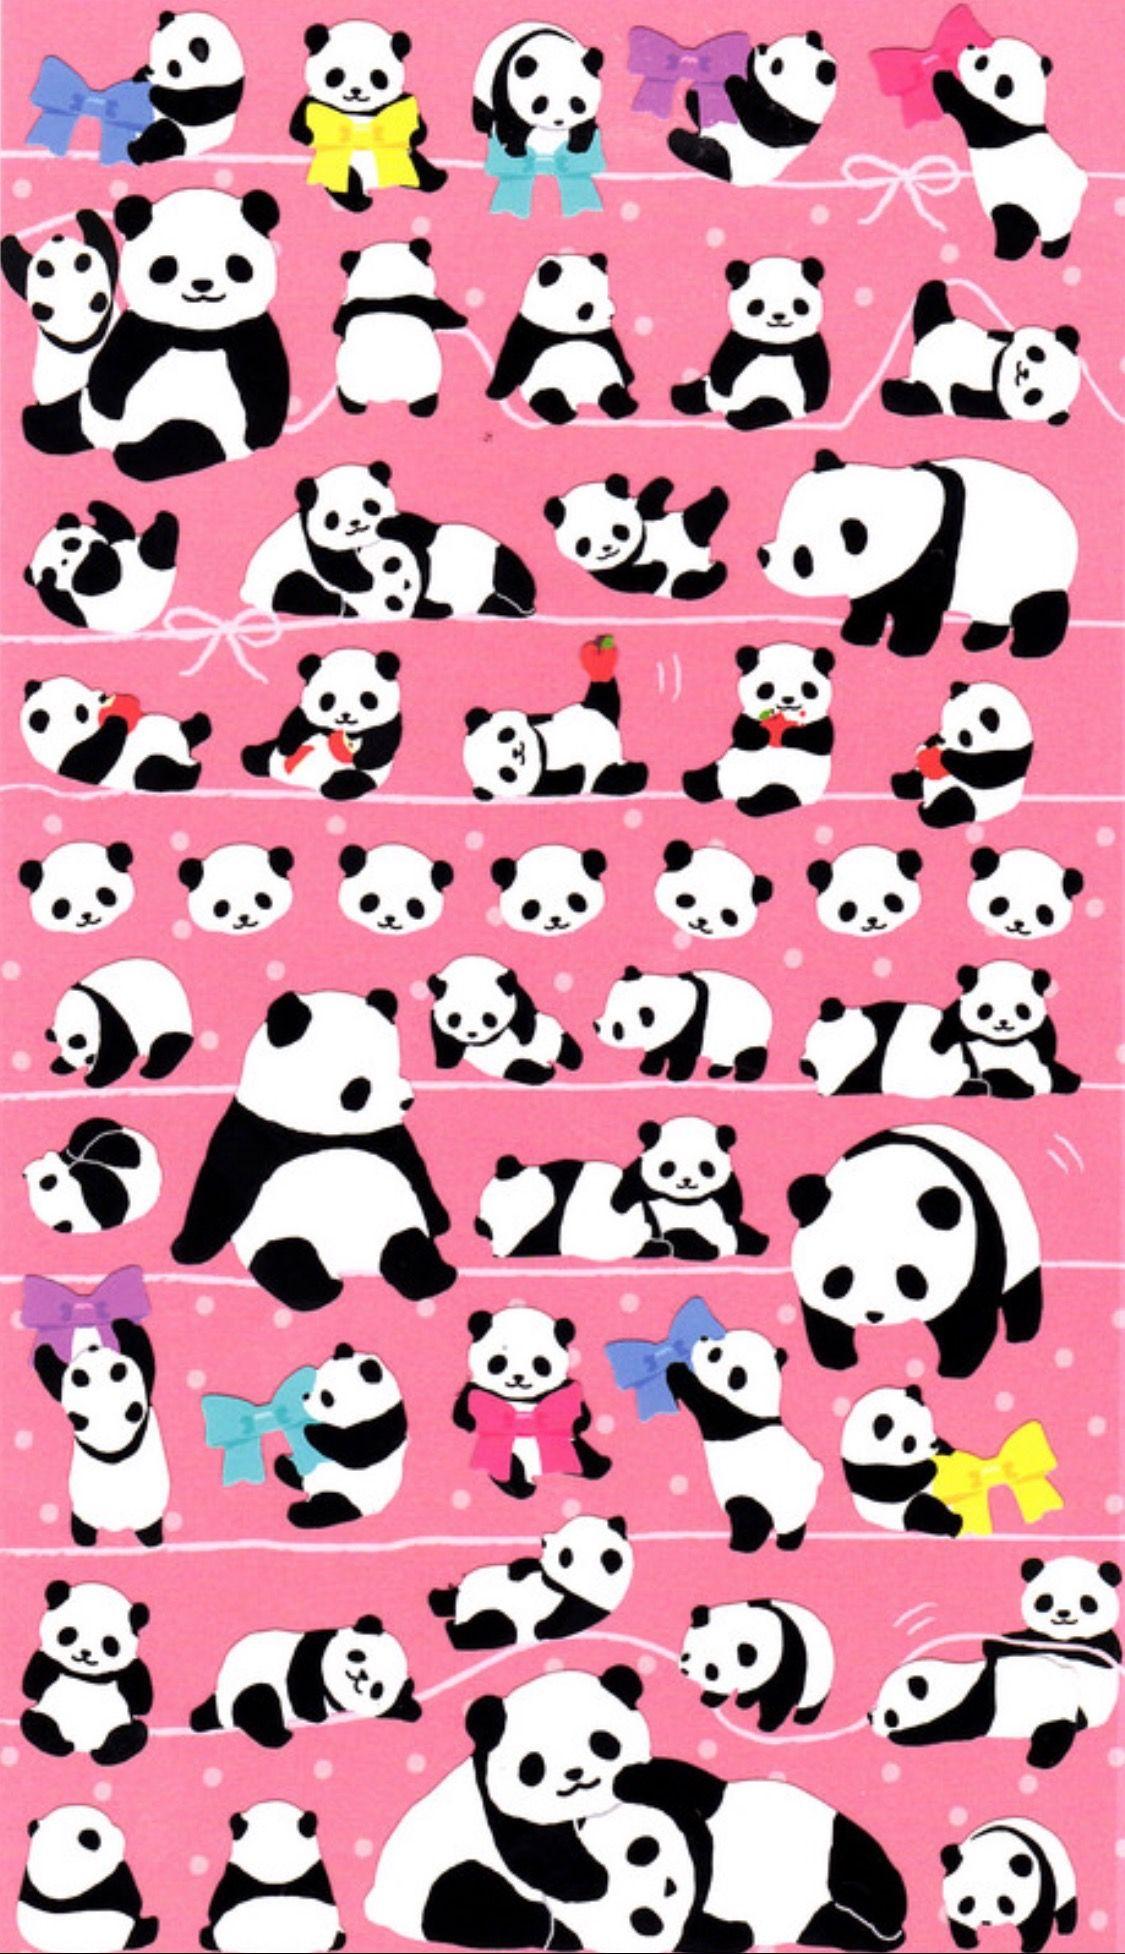 Panda Art Kawaii Wallpaper Pandas Pink